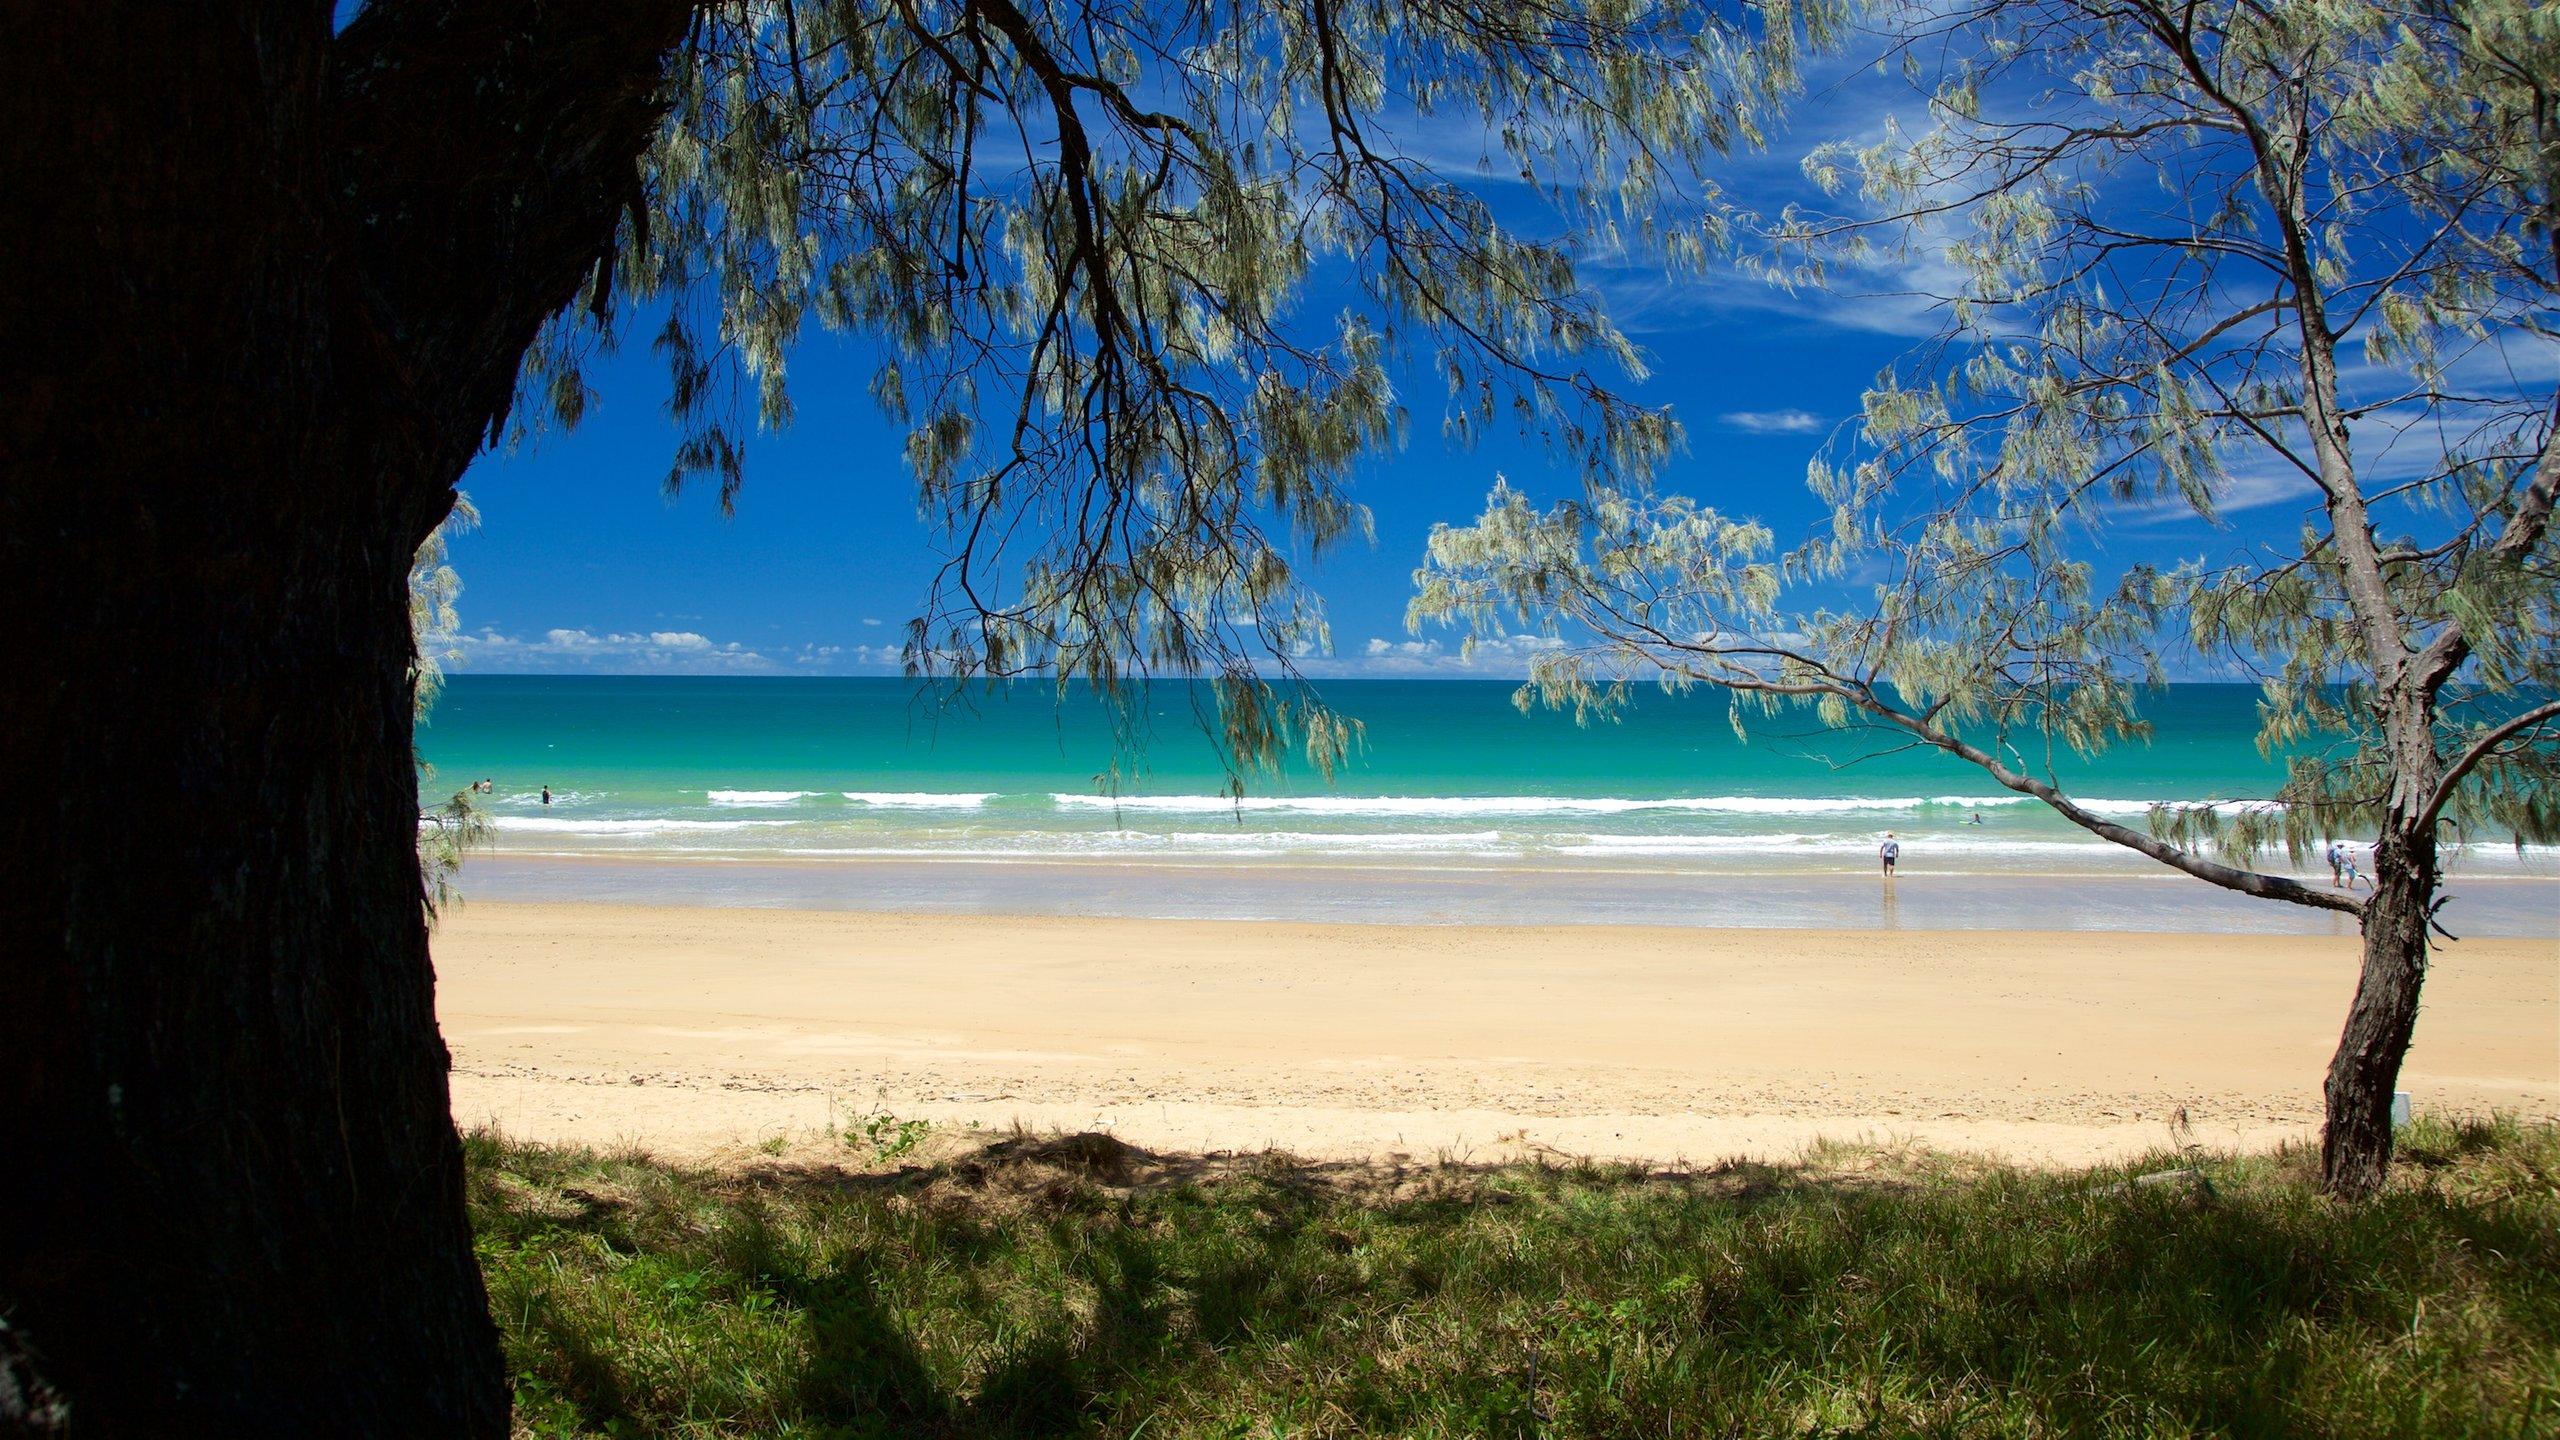 Bargara, Bundaberg, Queensland, Australia